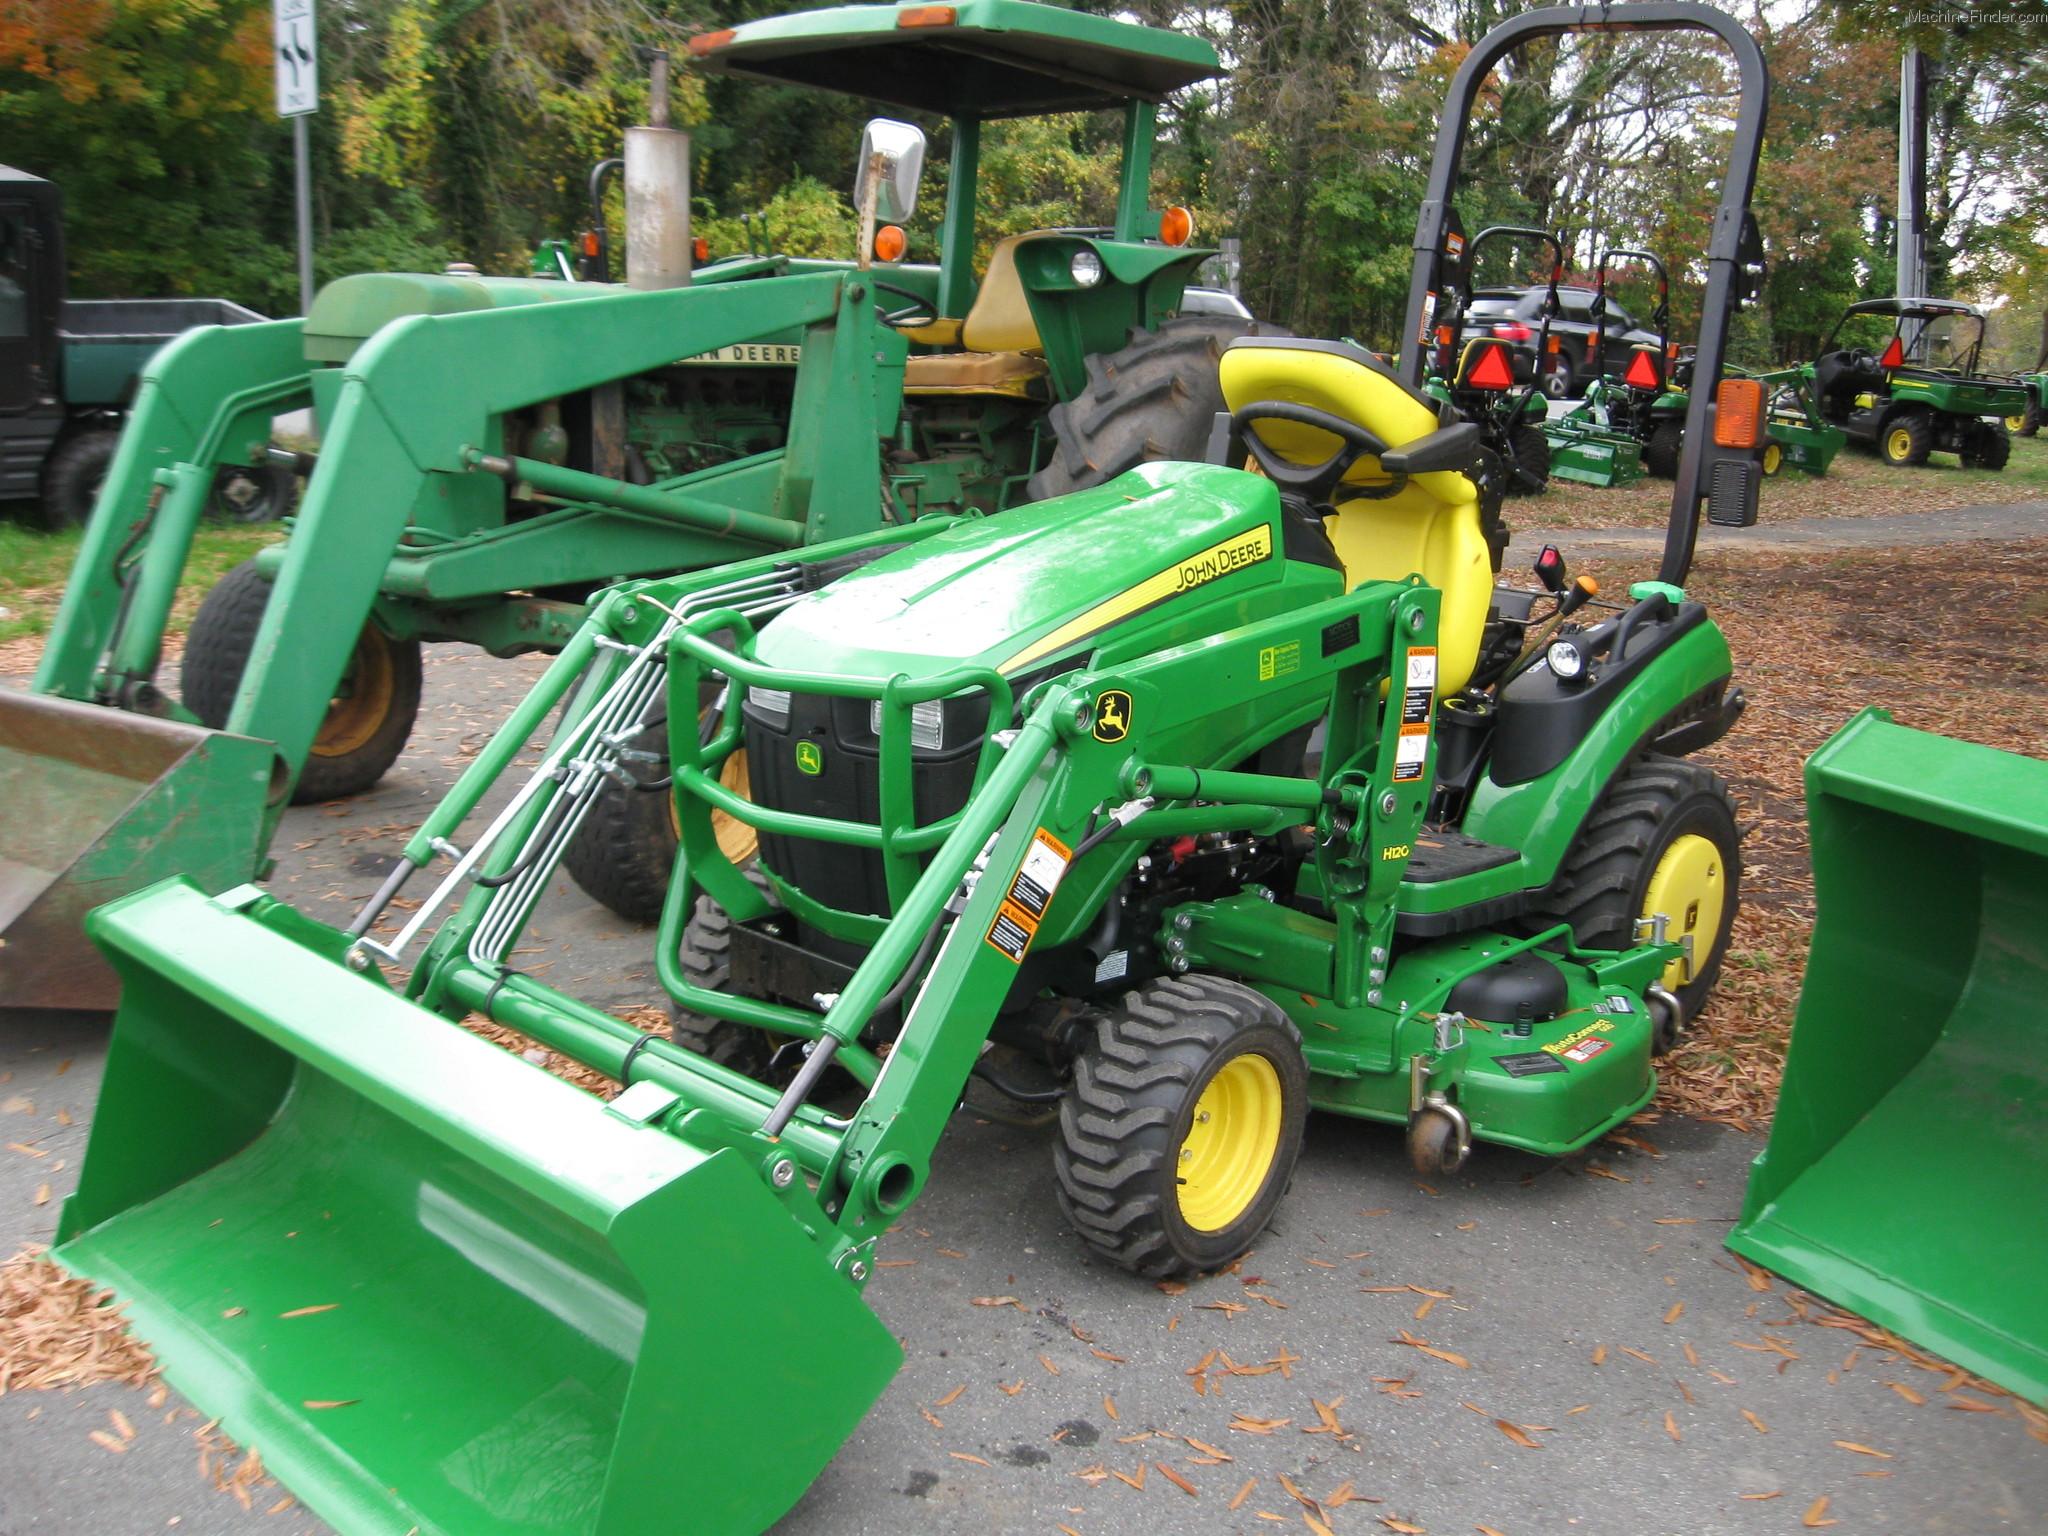 2014 John Deere 1025R Tractors - Compact (1-40hp.) - John ...